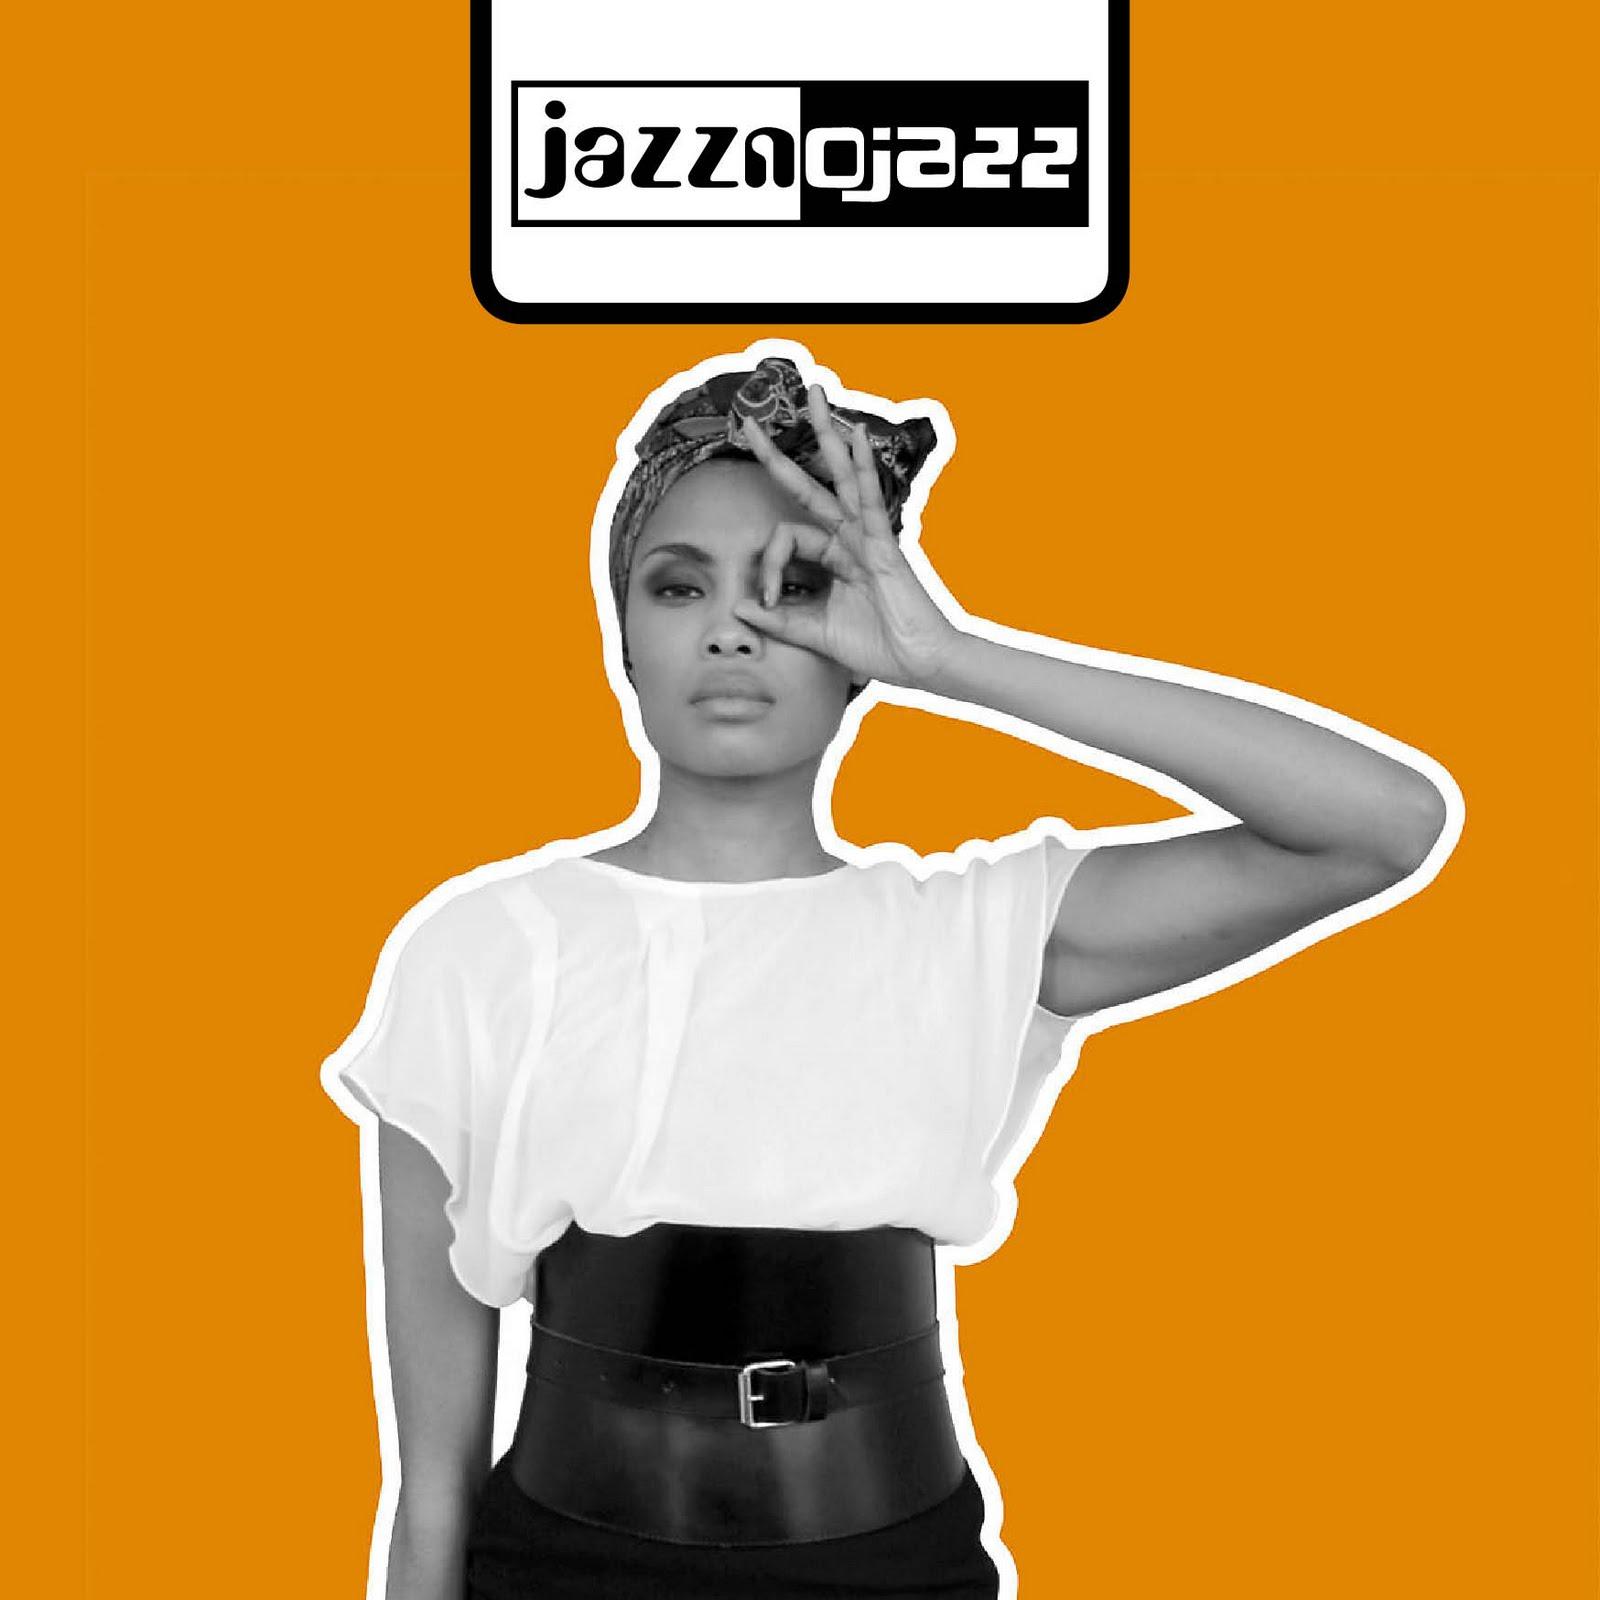 http://3.bp.blogspot.com/-qjwBXl5hy70/TpE-CkEd8vI/AAAAAAAAAXM/DJ-szv4kM1I/s1600/Imany.jazznojazz-Art-Logo-Oben.jpg